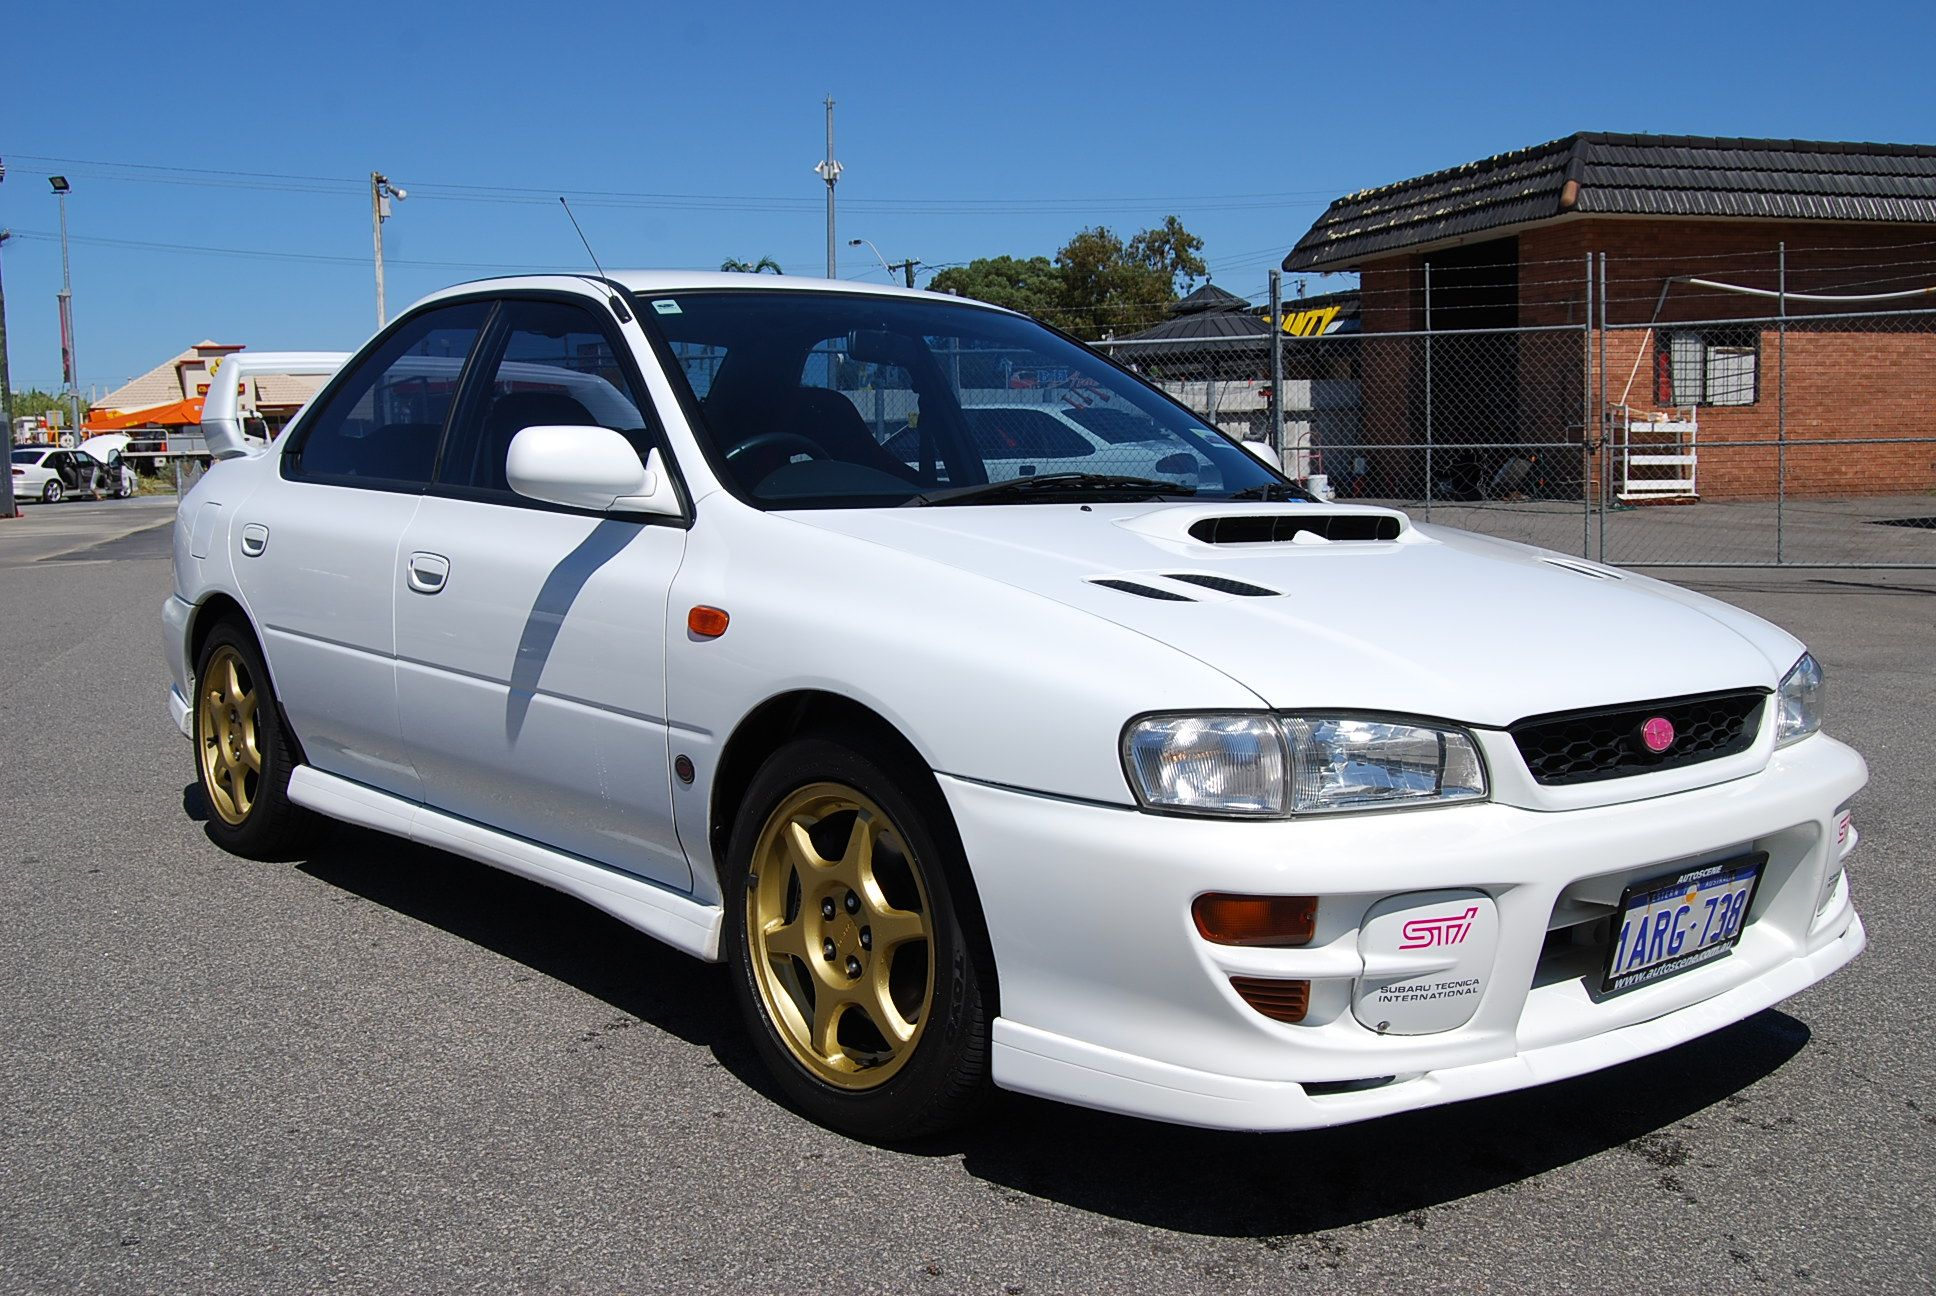 1999 SUBARU IMPREZA MY00 WRX STi Version 6 Wrx, Subaru